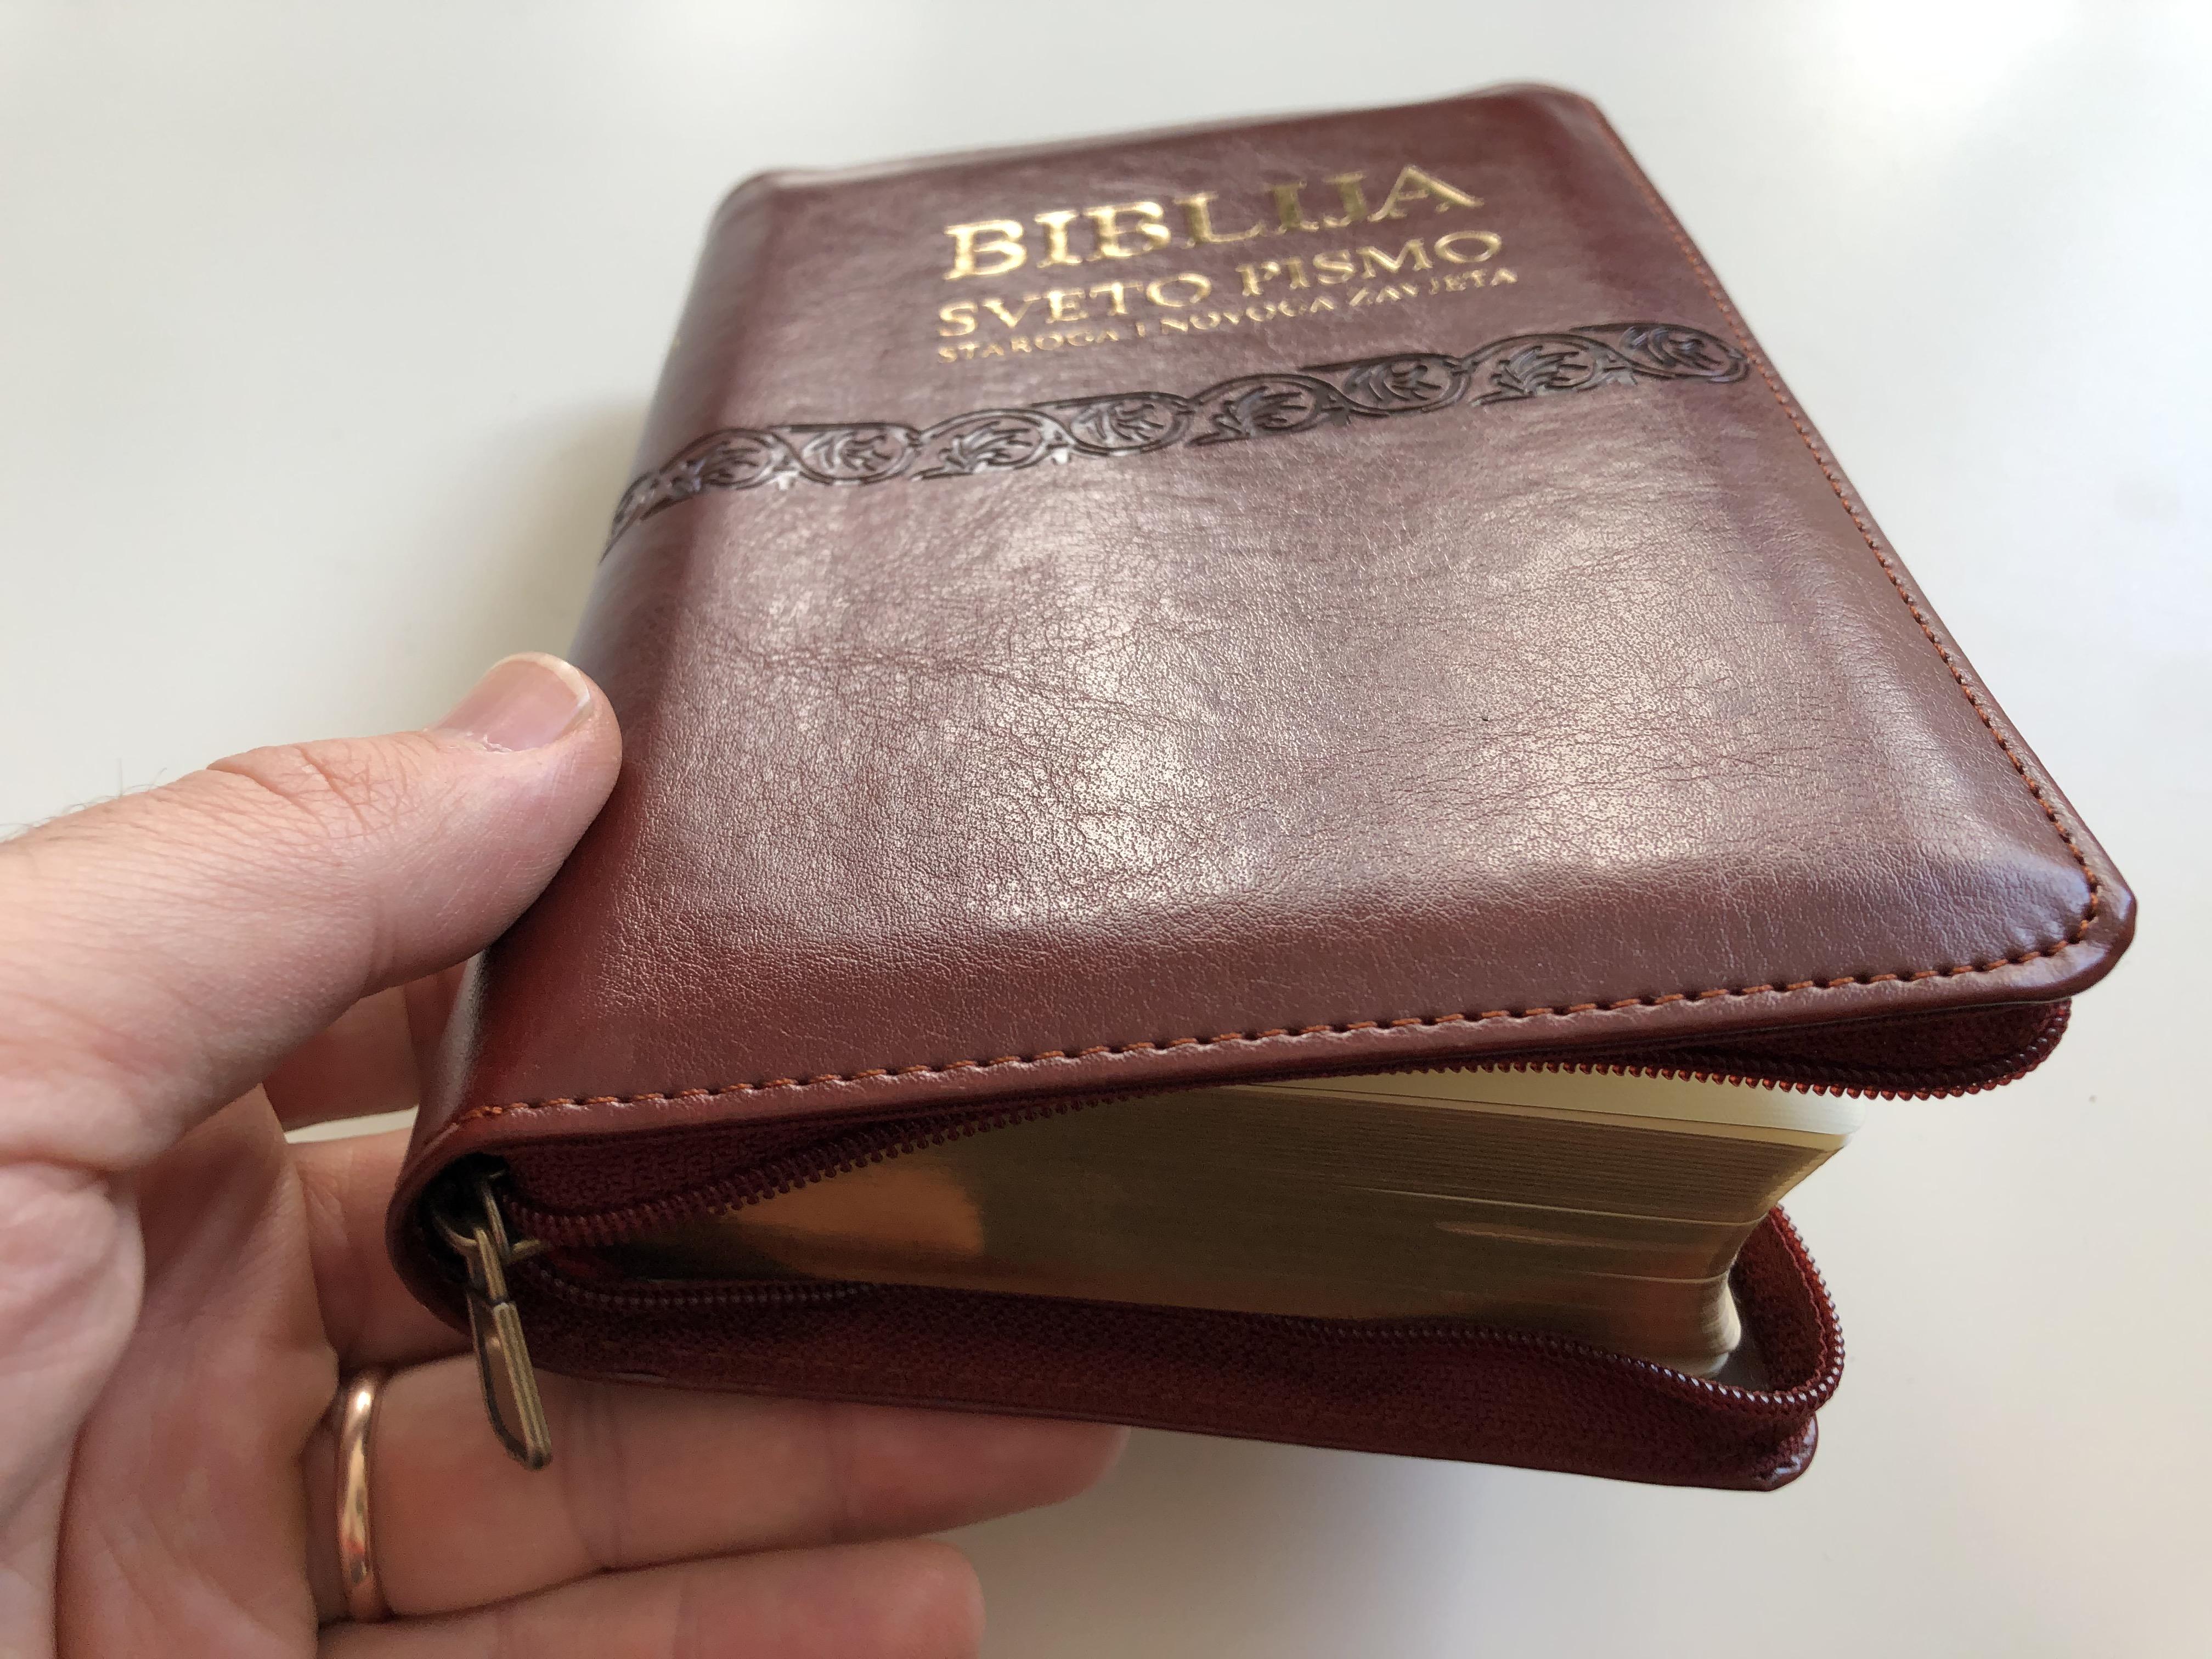 biblija-sveto-pismo-staroga-i-novoga-zavjeta-small-size-brown-15.jpg